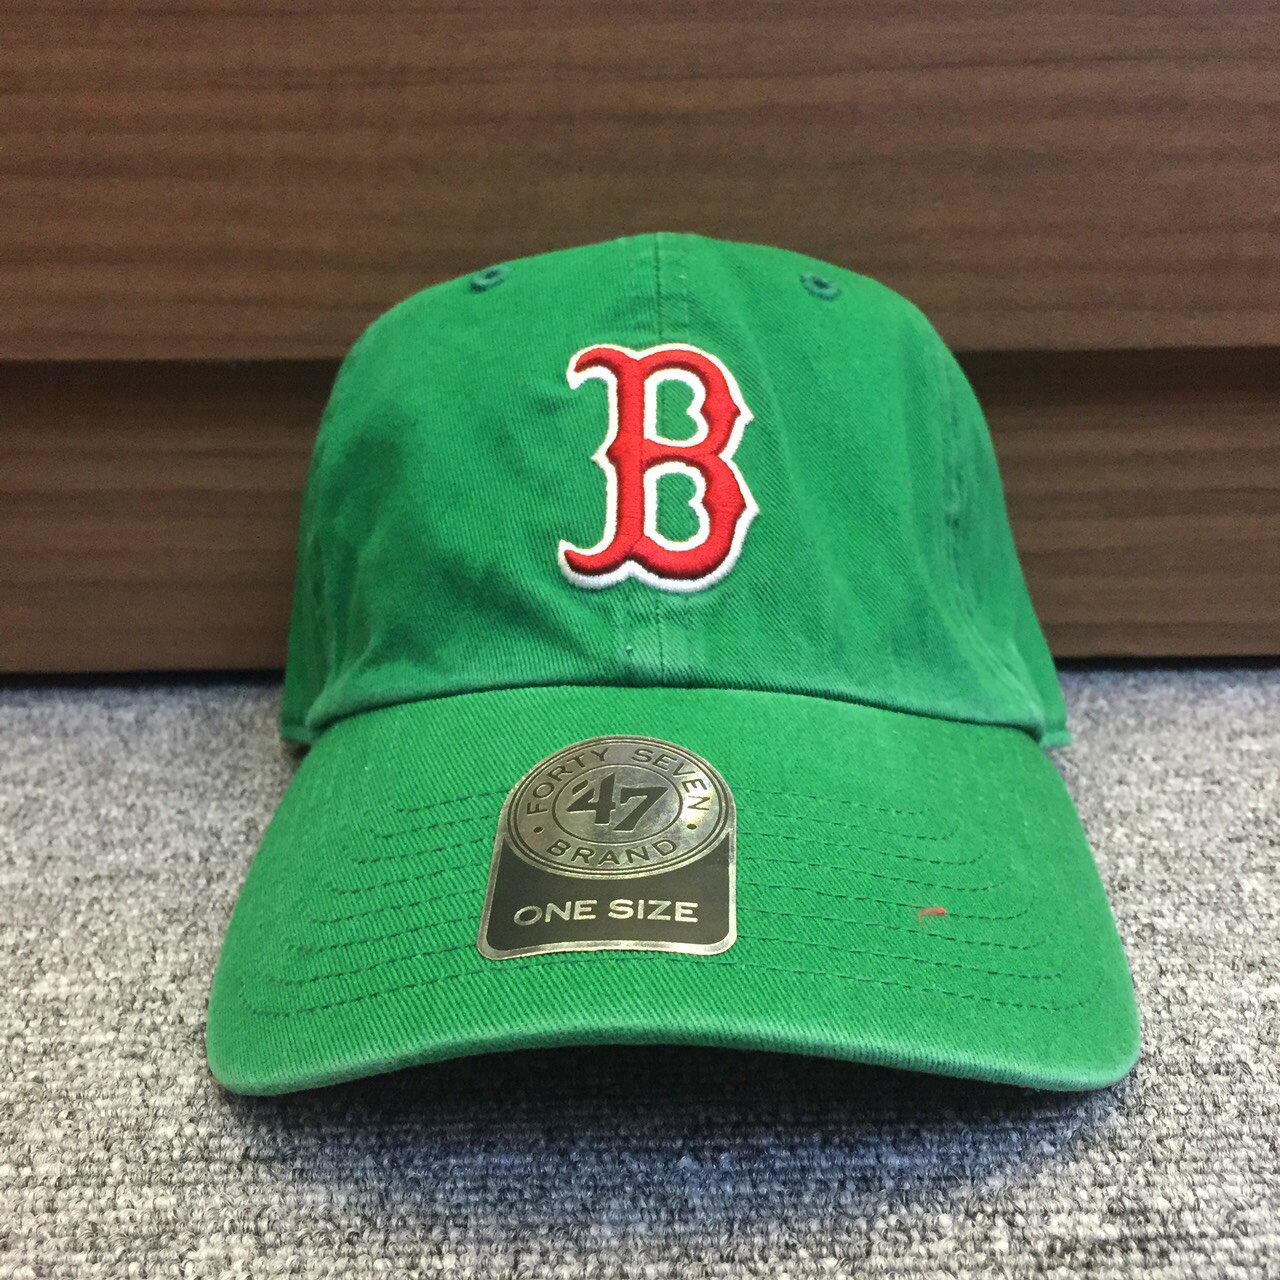 BEETLE 47 BRAND 老帽 波士頓紅襪 BOSTON RED SOX DAD 大聯盟 MLB 全綠 紅字 MN-410 0